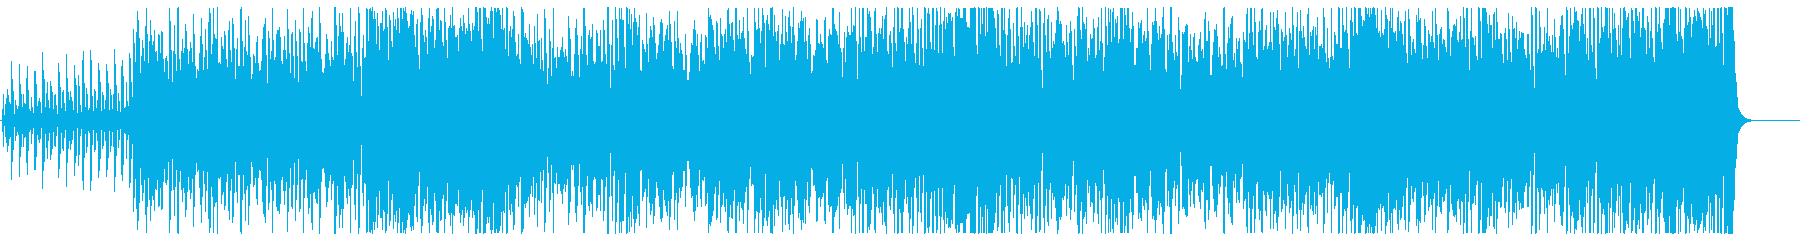 dixiの再生済みの波形